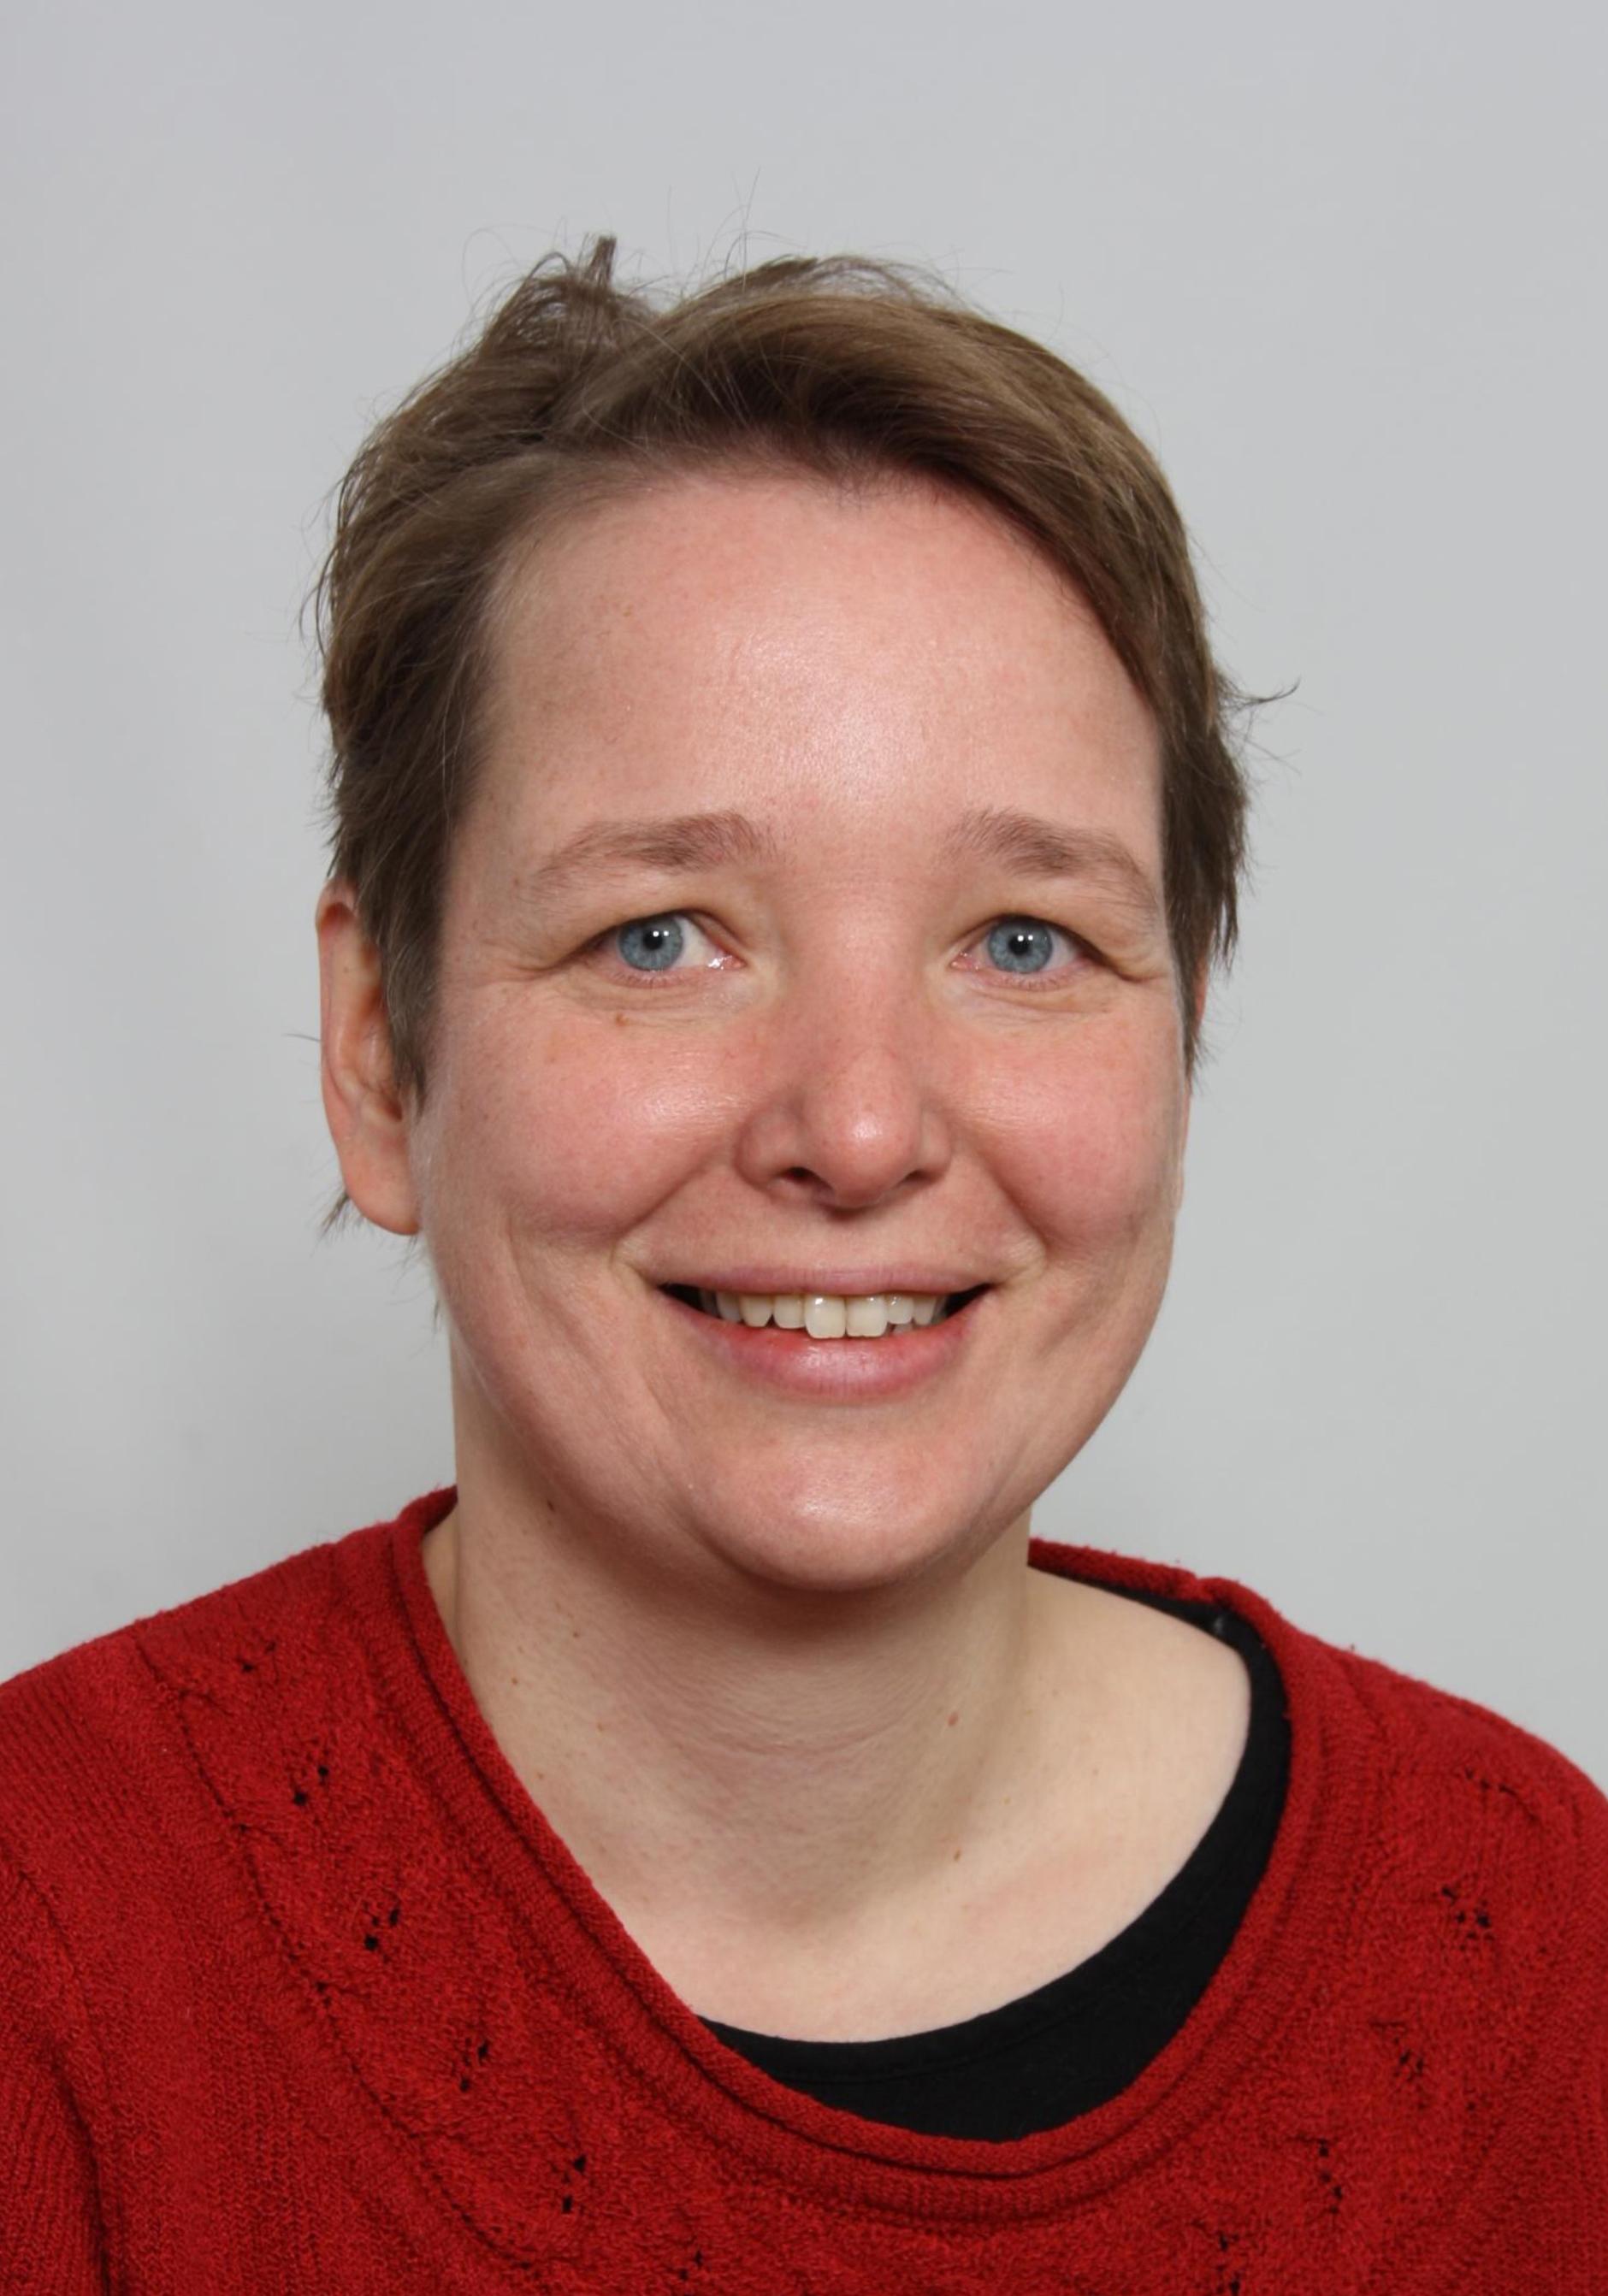 Anita Kalsbeek